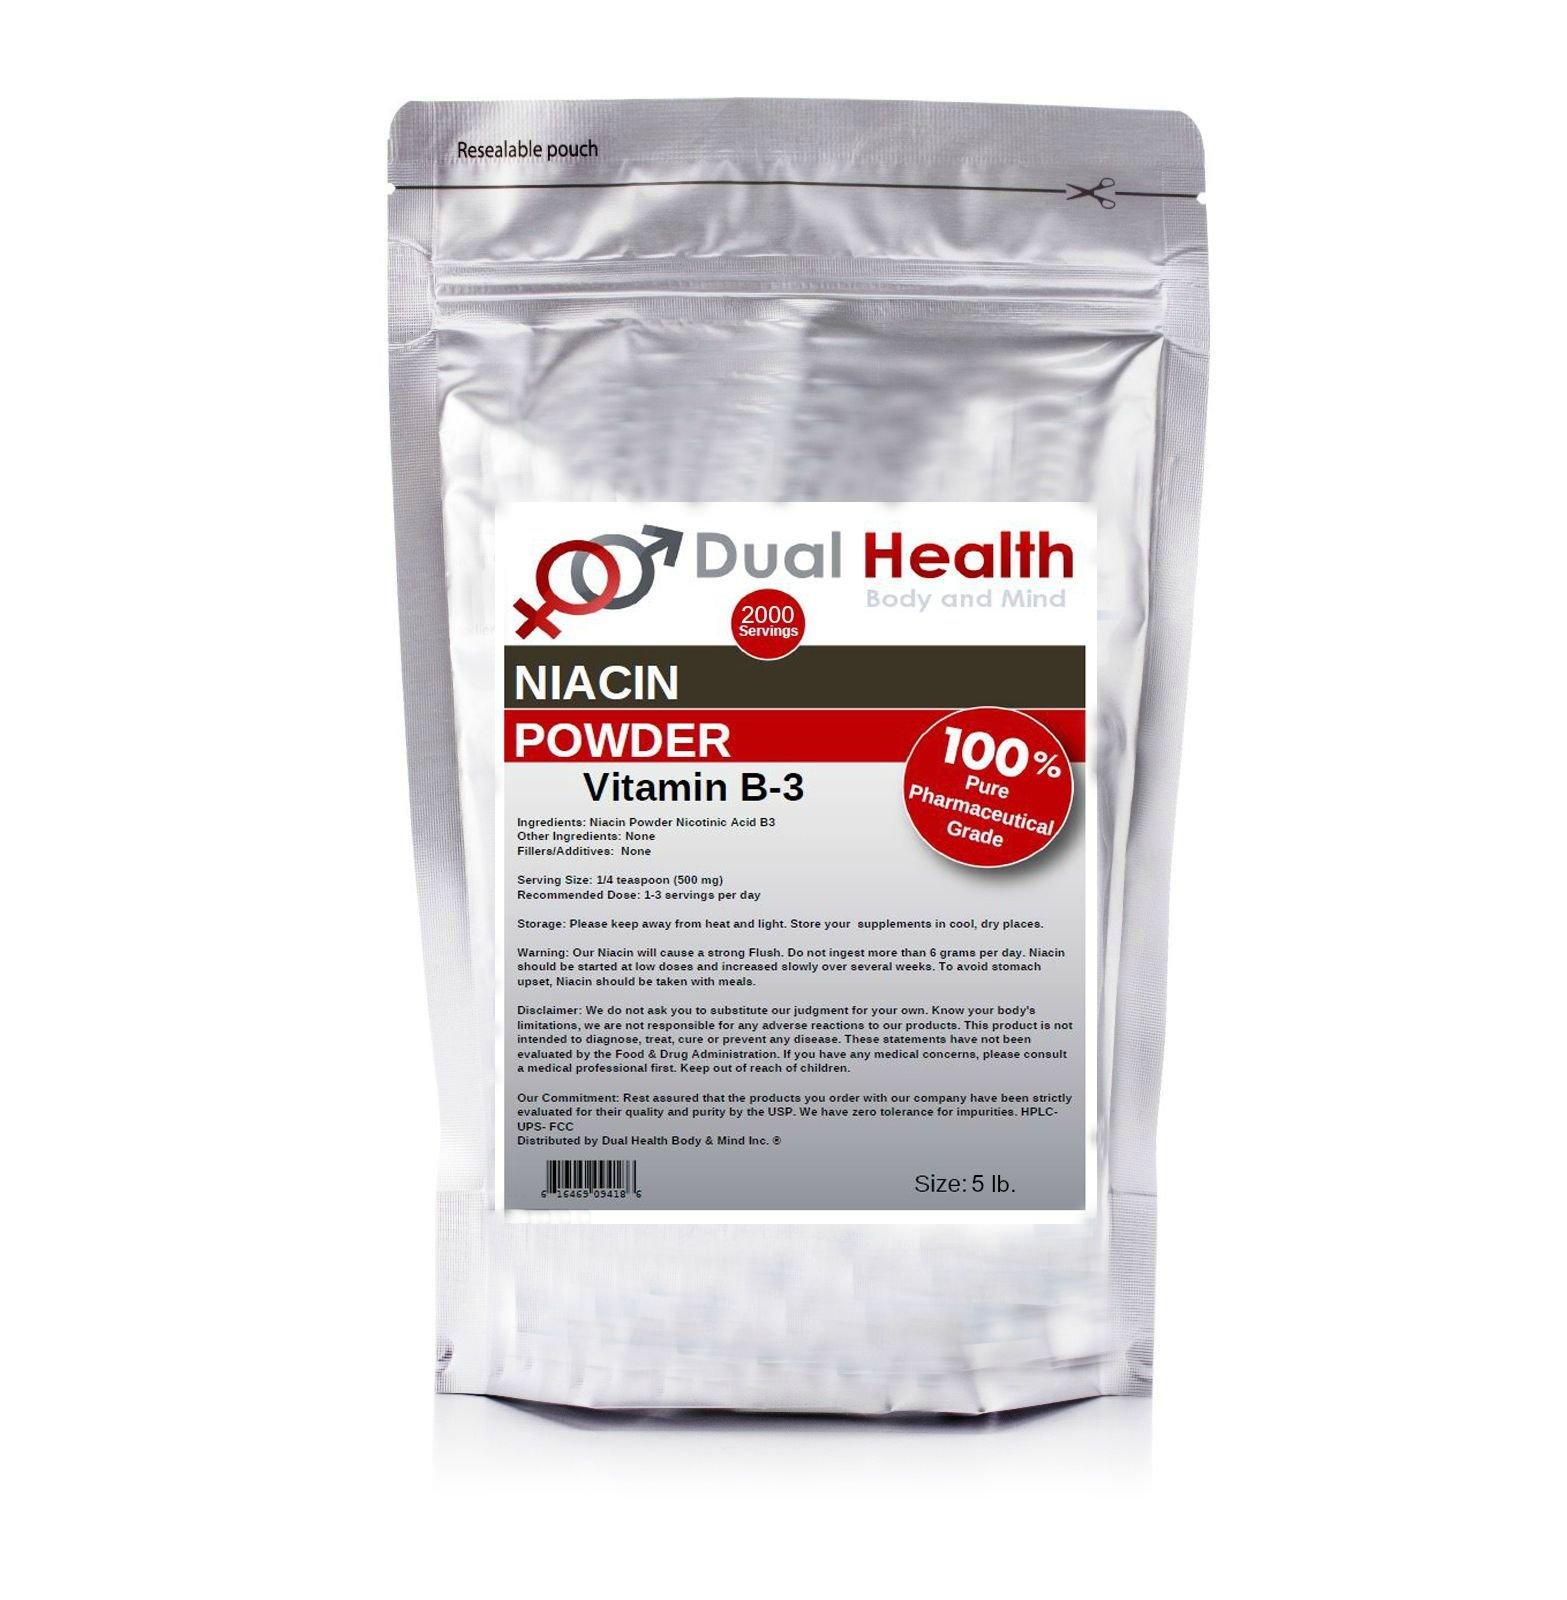 5 lb. Niacin Nicotinic Acid Powder (2.27kg) Vitamin B3 Lower Cholesterol Heart Health Pharmaceutical Micronized USP & FCC Food Grade By Dual Health